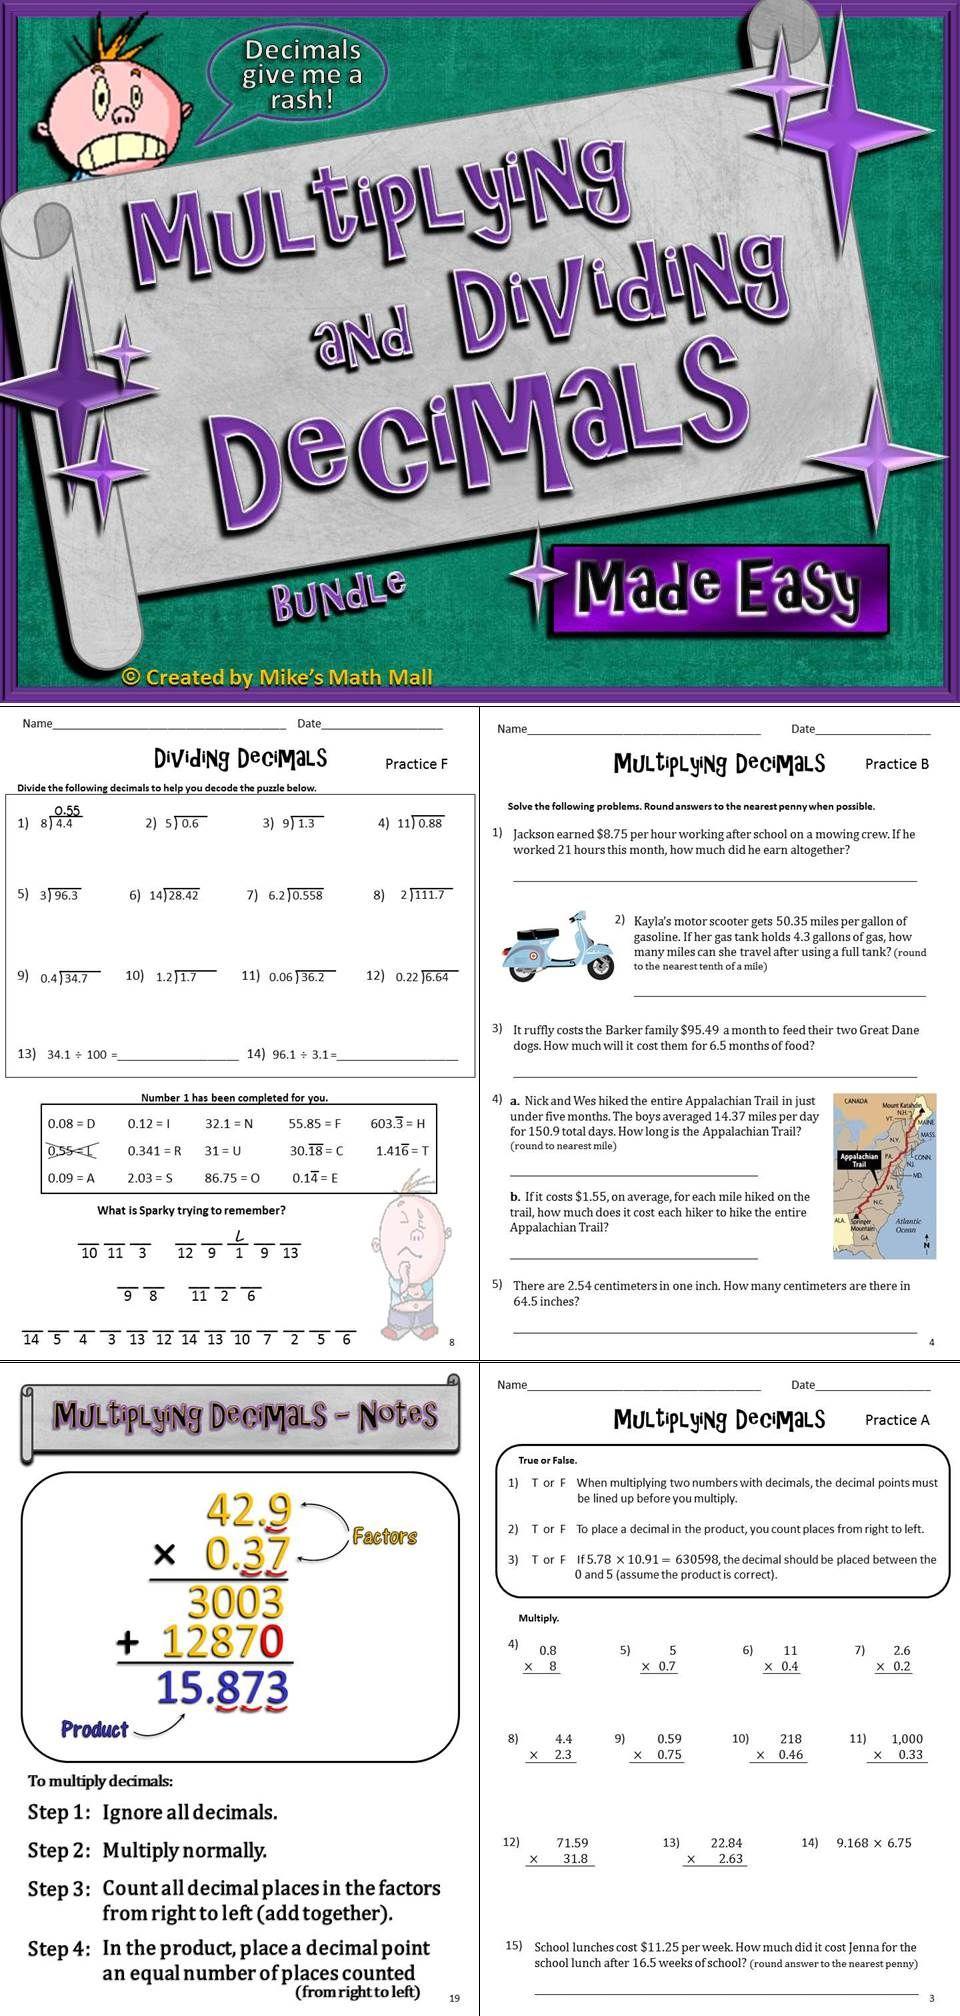 multiplying and dividing decimals made easy bundled unit math for sixth grade pinterest. Black Bedroom Furniture Sets. Home Design Ideas